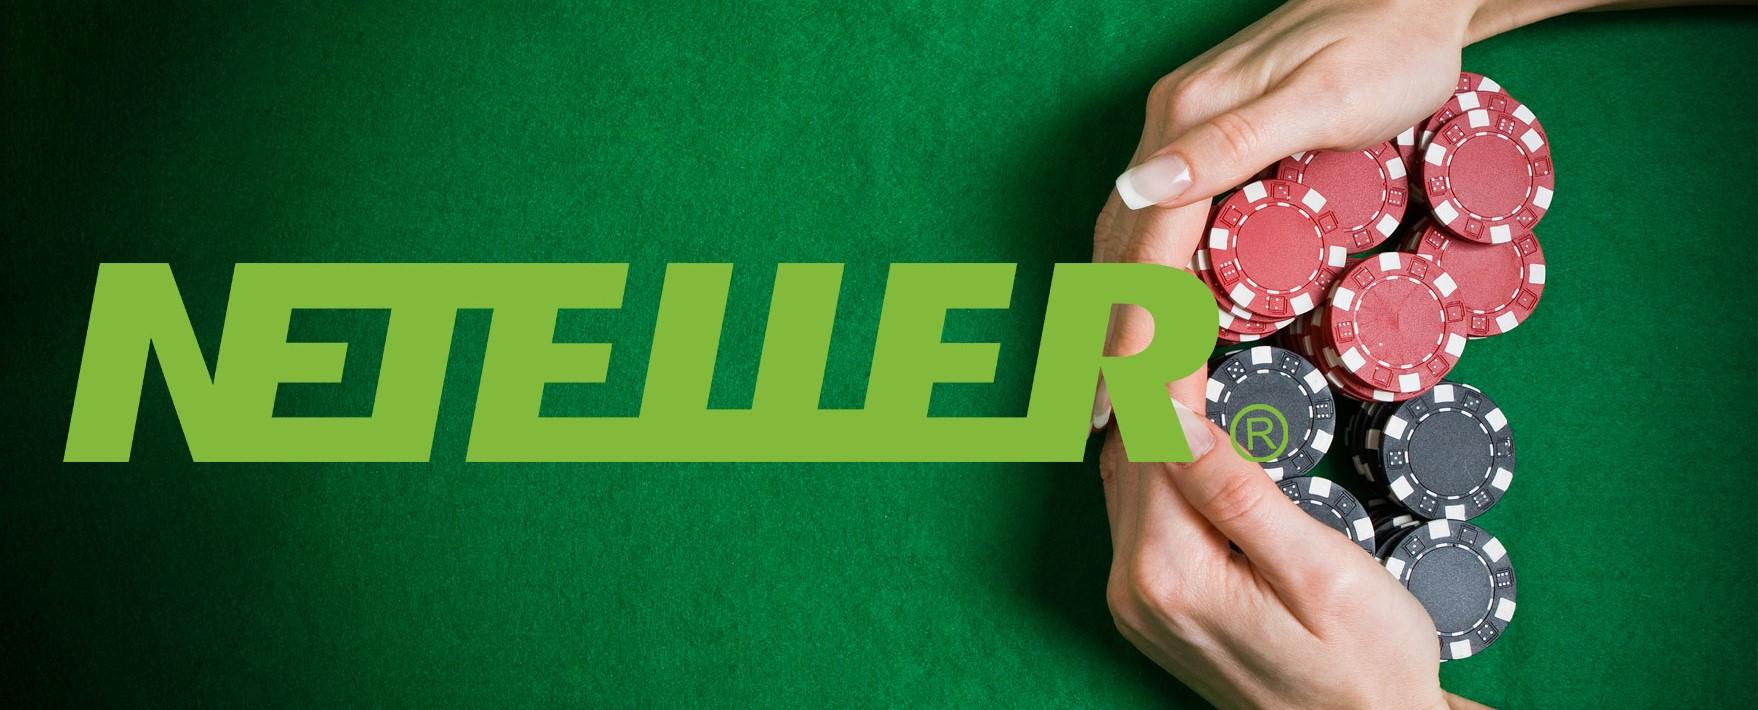 Neteller online casinos in Canada